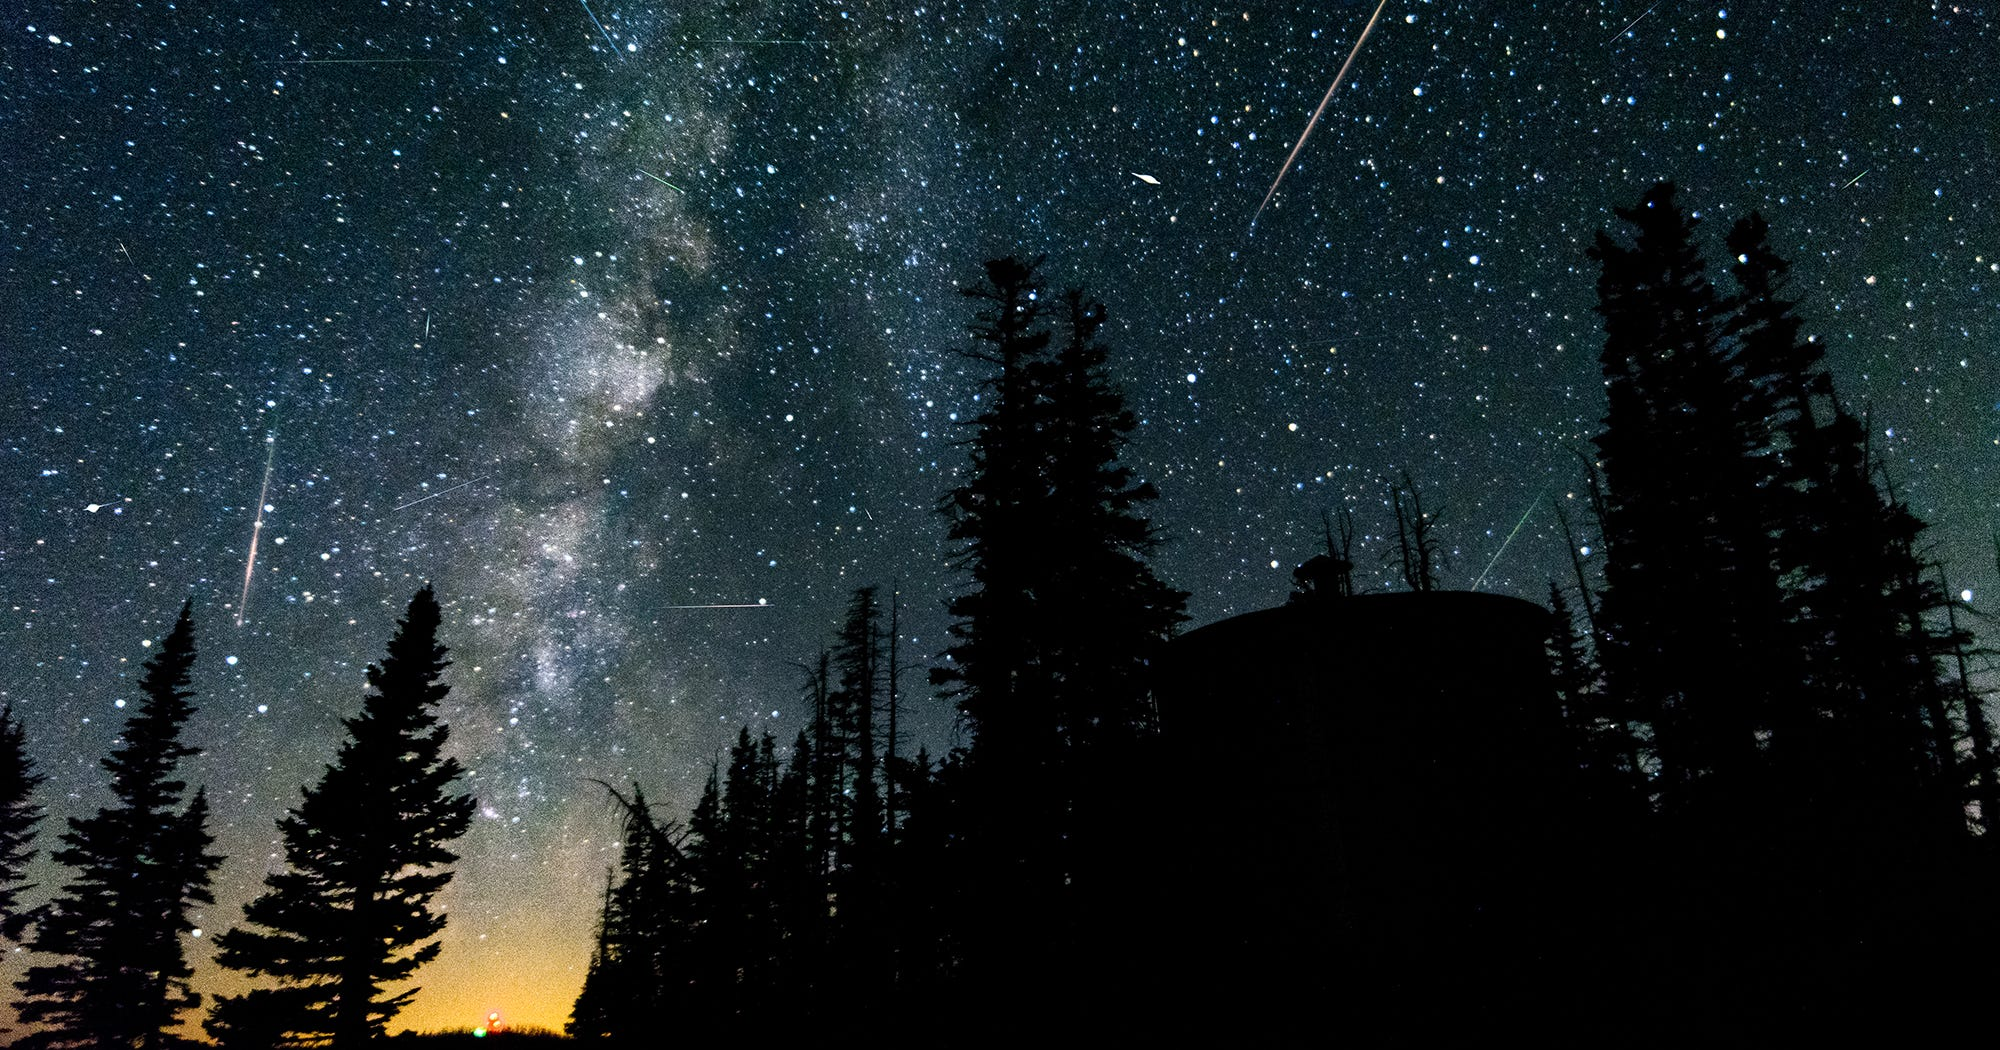 Lyrid Meteor Shower April 2019 How To See Peak Time